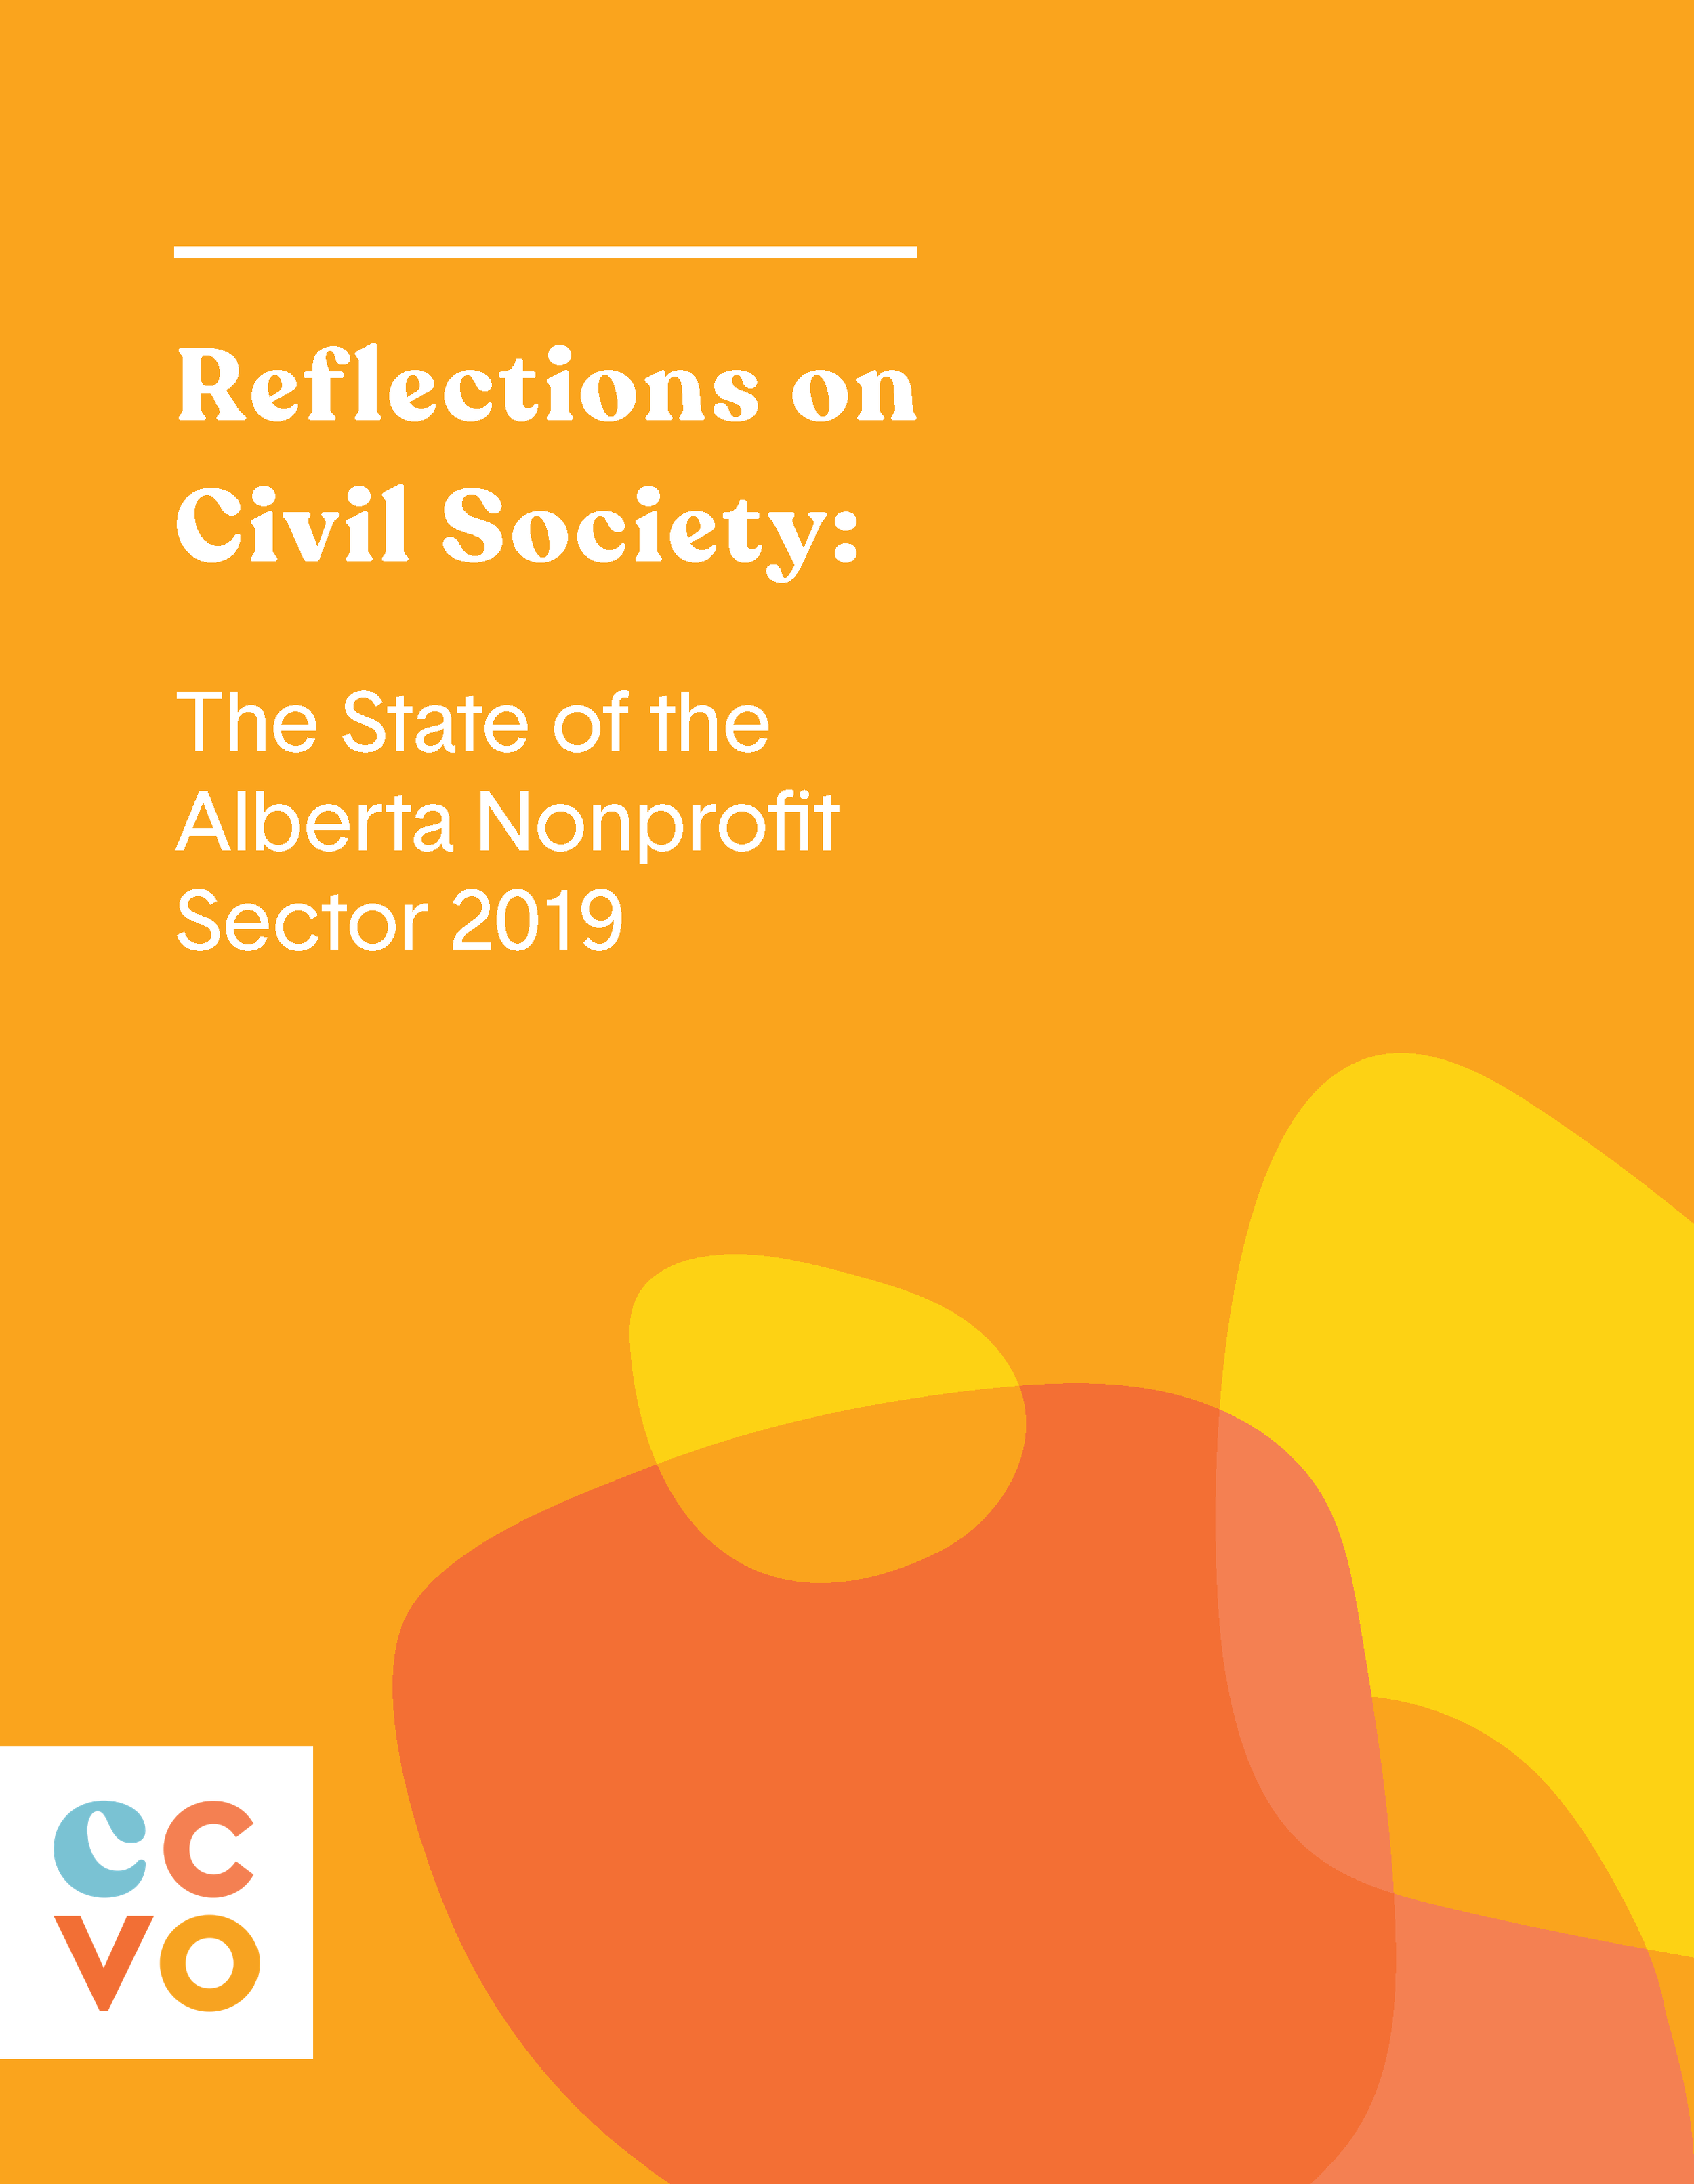 Reflecting on Civil Society.png